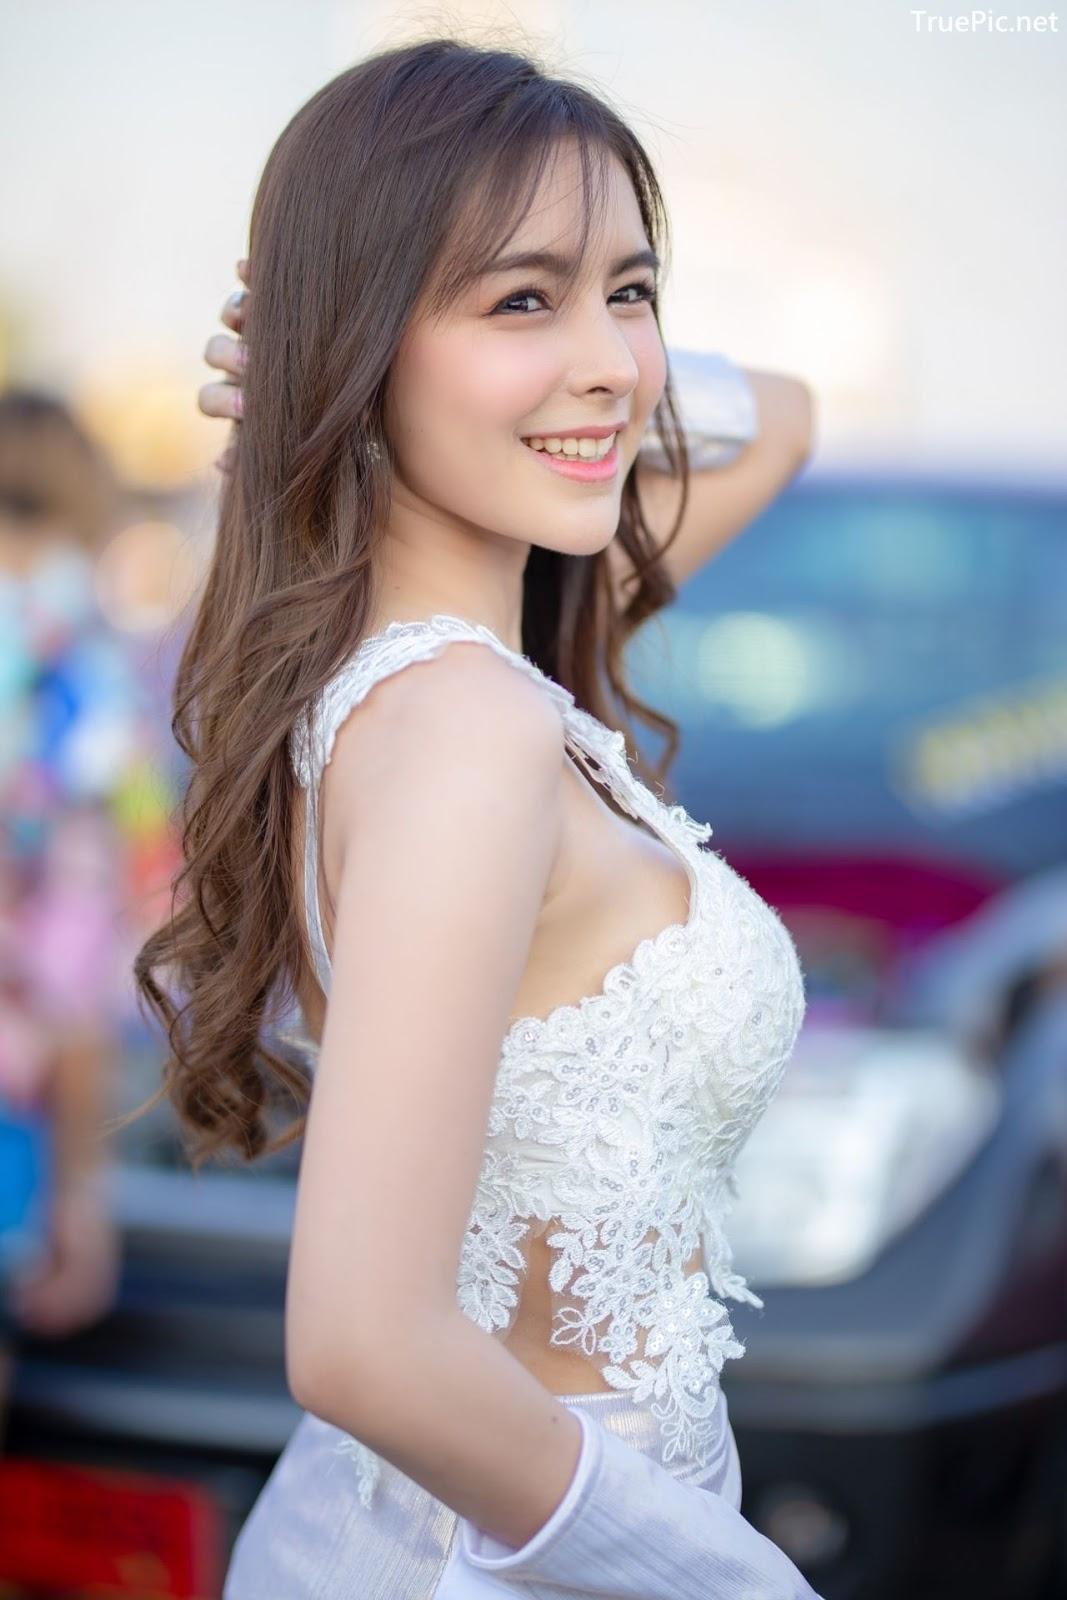 Thailand Hot Model - Thai Racing Girl At Pathum-Thani Speedway